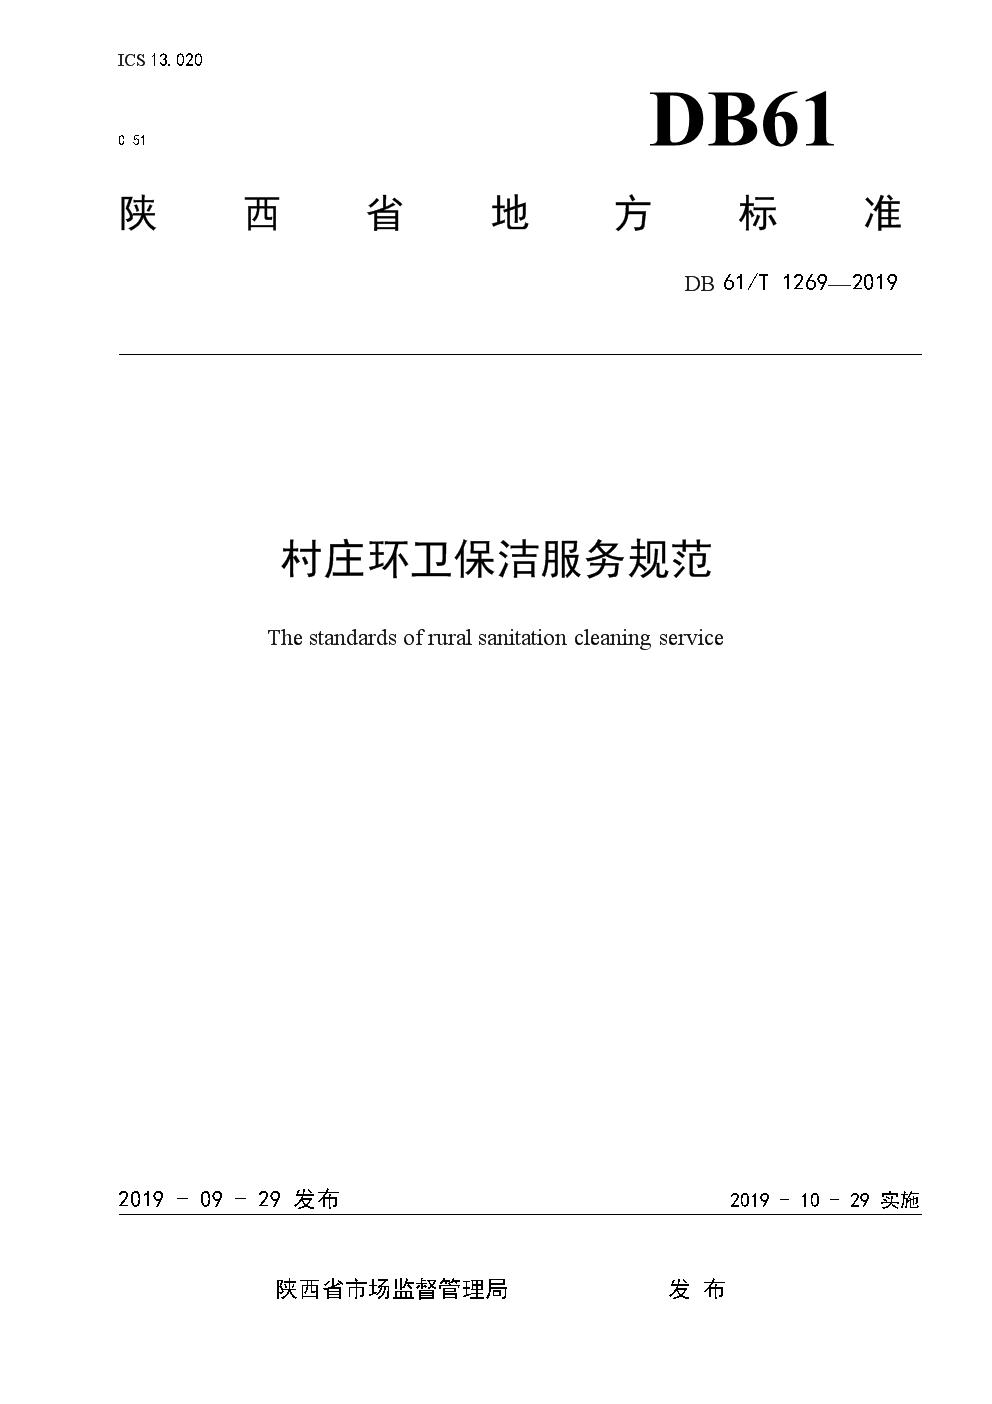 DB61∕T 1269-2019 村庄环卫保洁服务规范.pdf-2020-09-26-01-28-50-617.docx